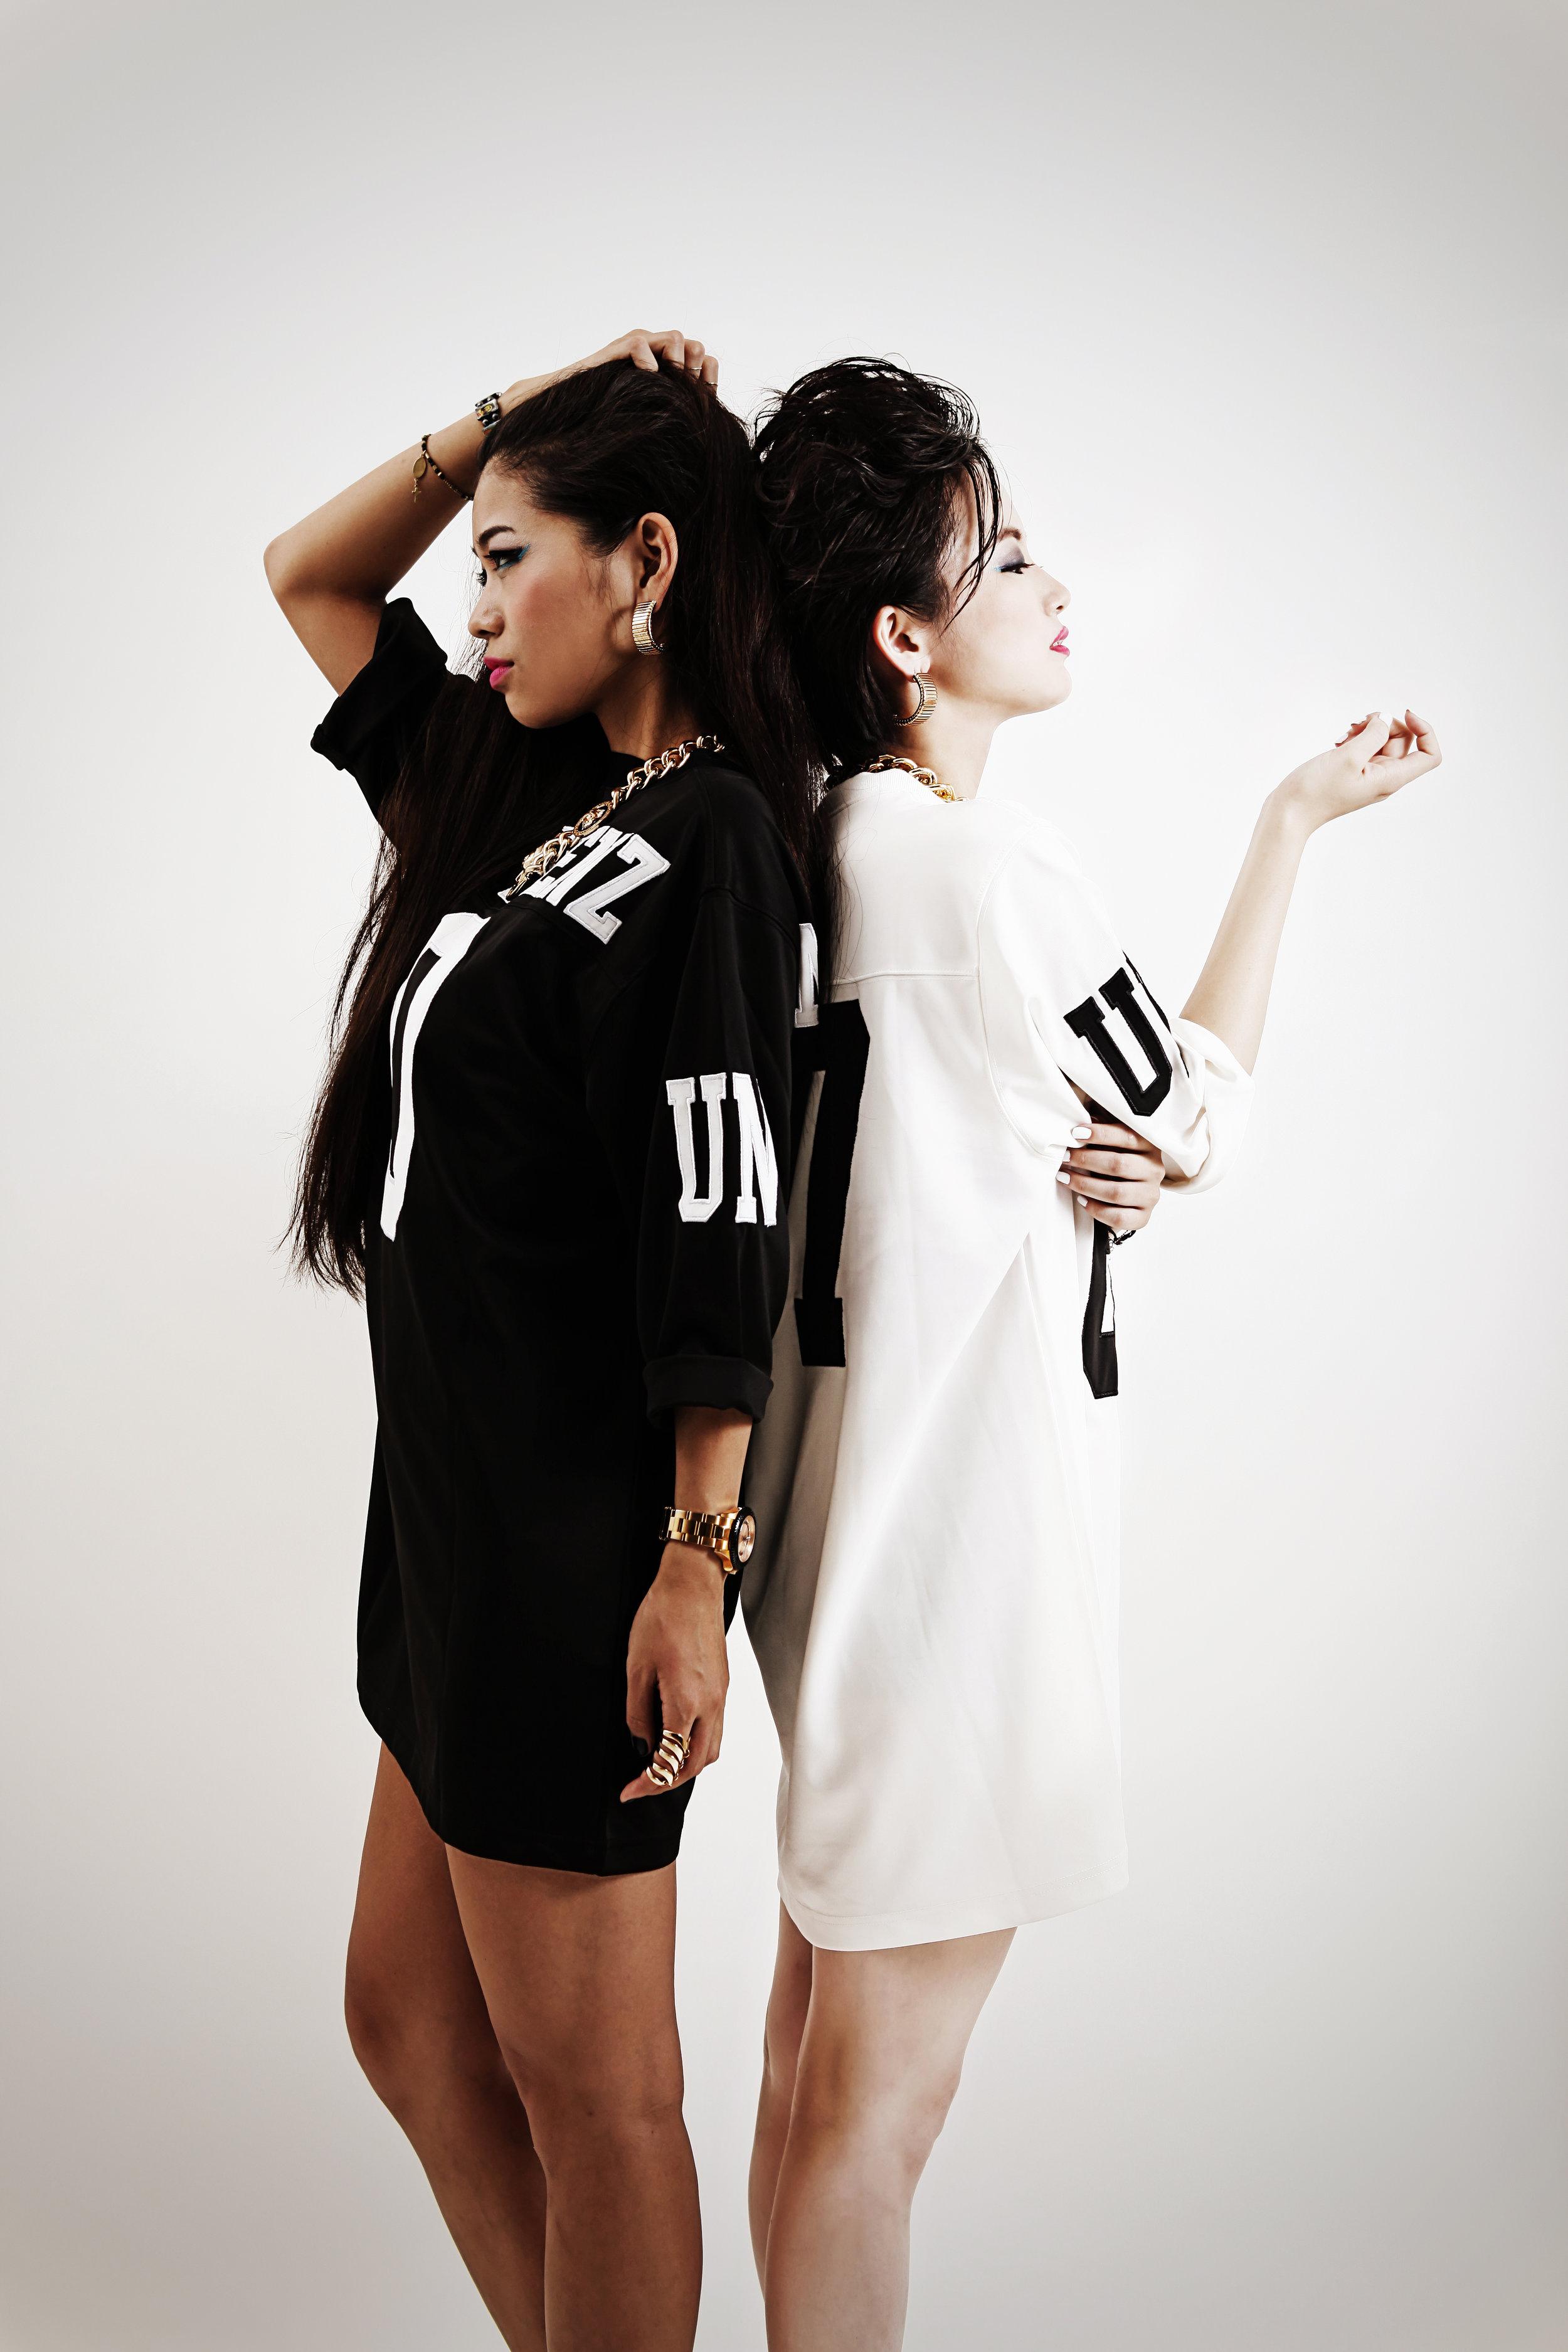 twOasOne - DJ / Producer